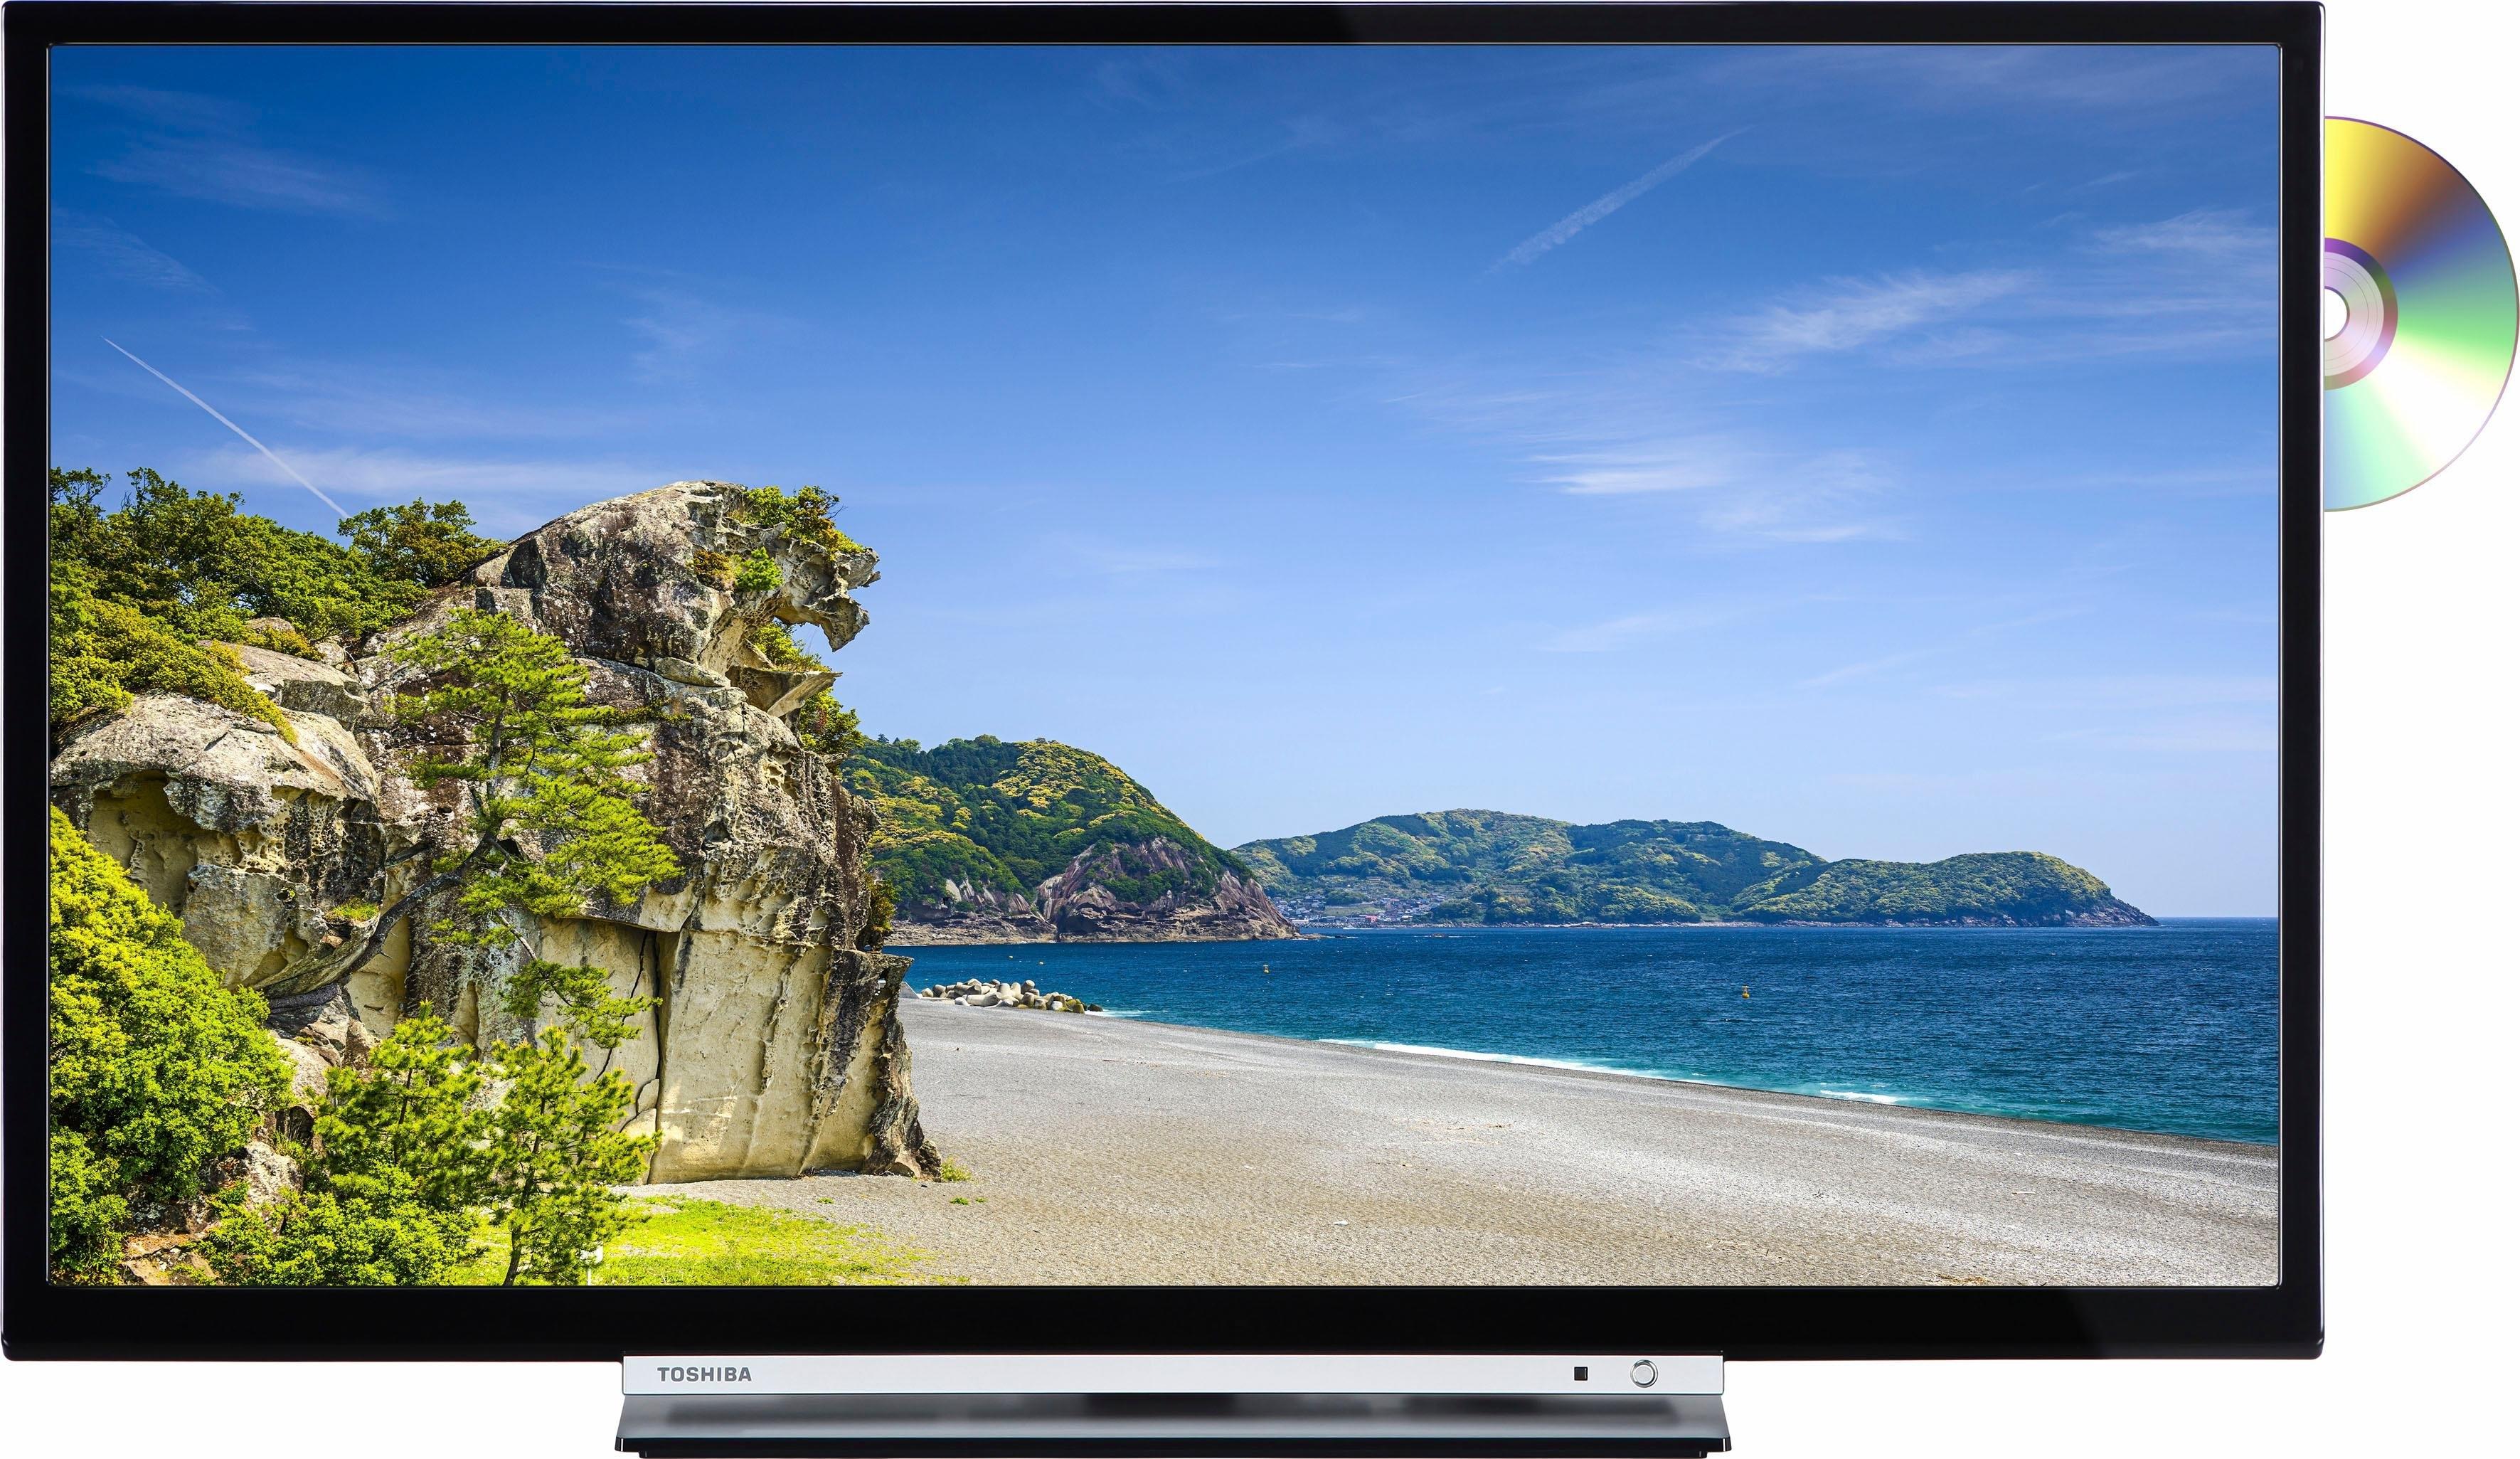 Toshiba 32D3763DA led-tv (81 cm / 32 inch, Full HD, smart-tv) goedkoop op otto.nl kopen